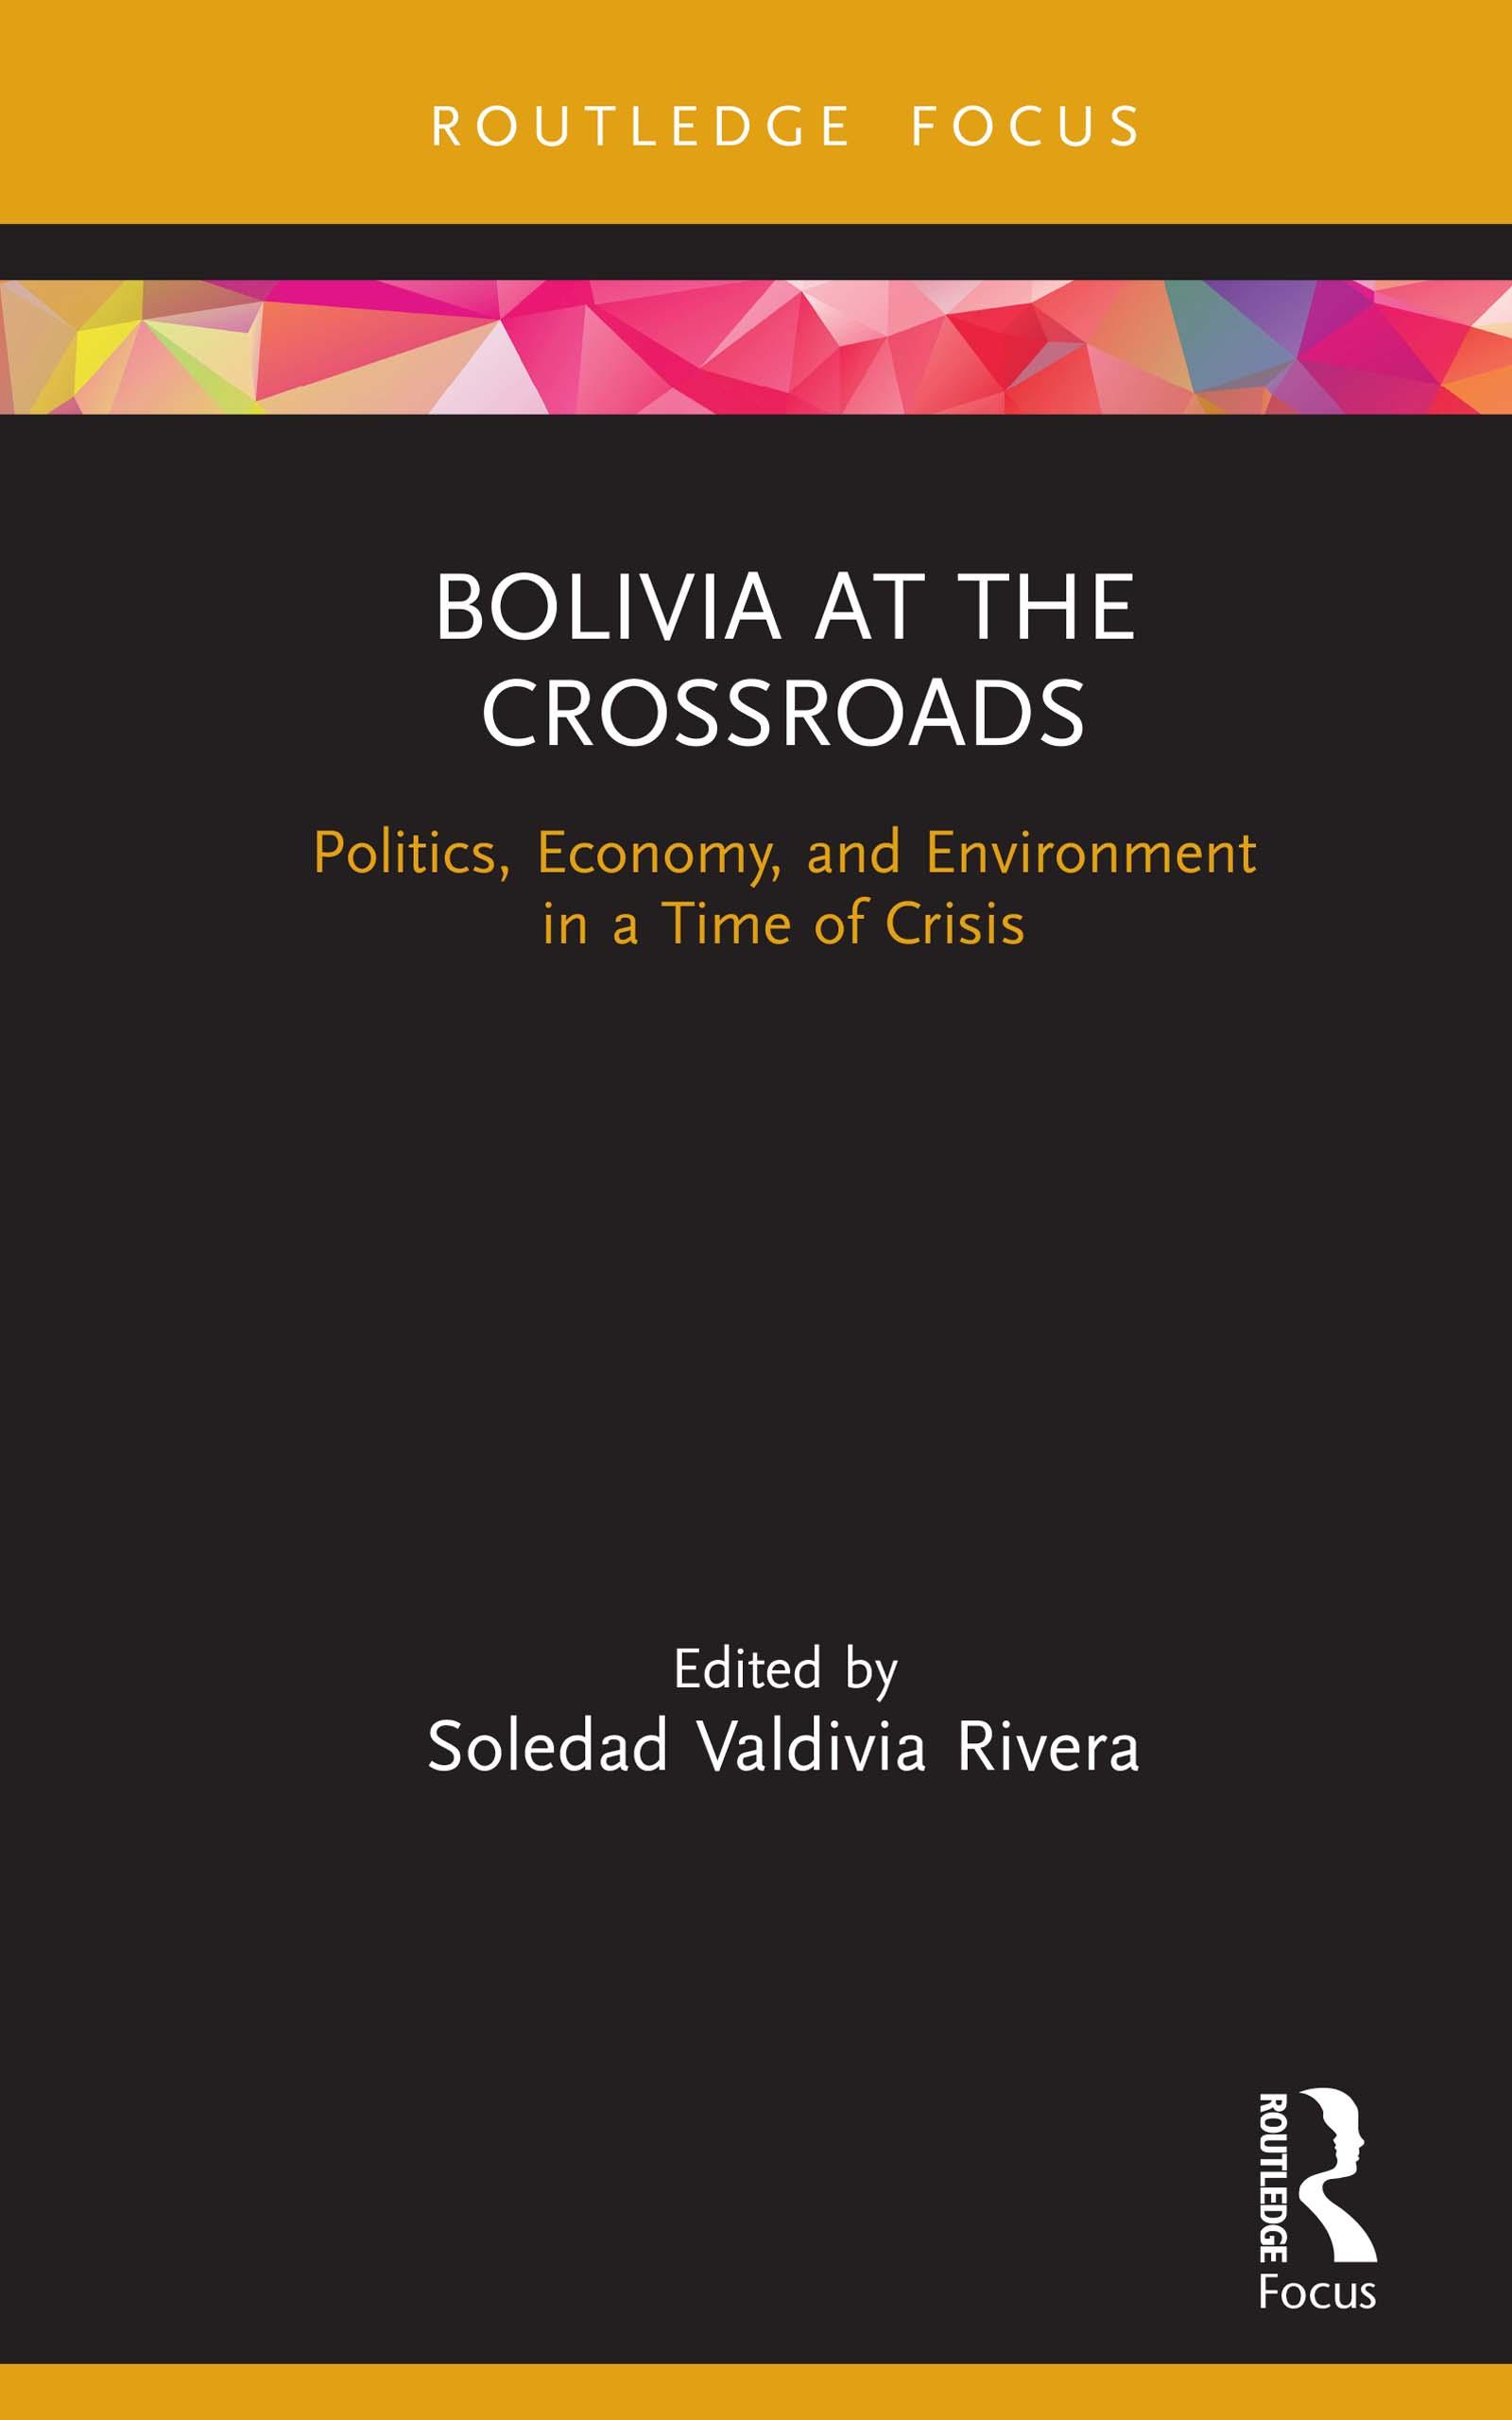 Bolivia at the Crossroads